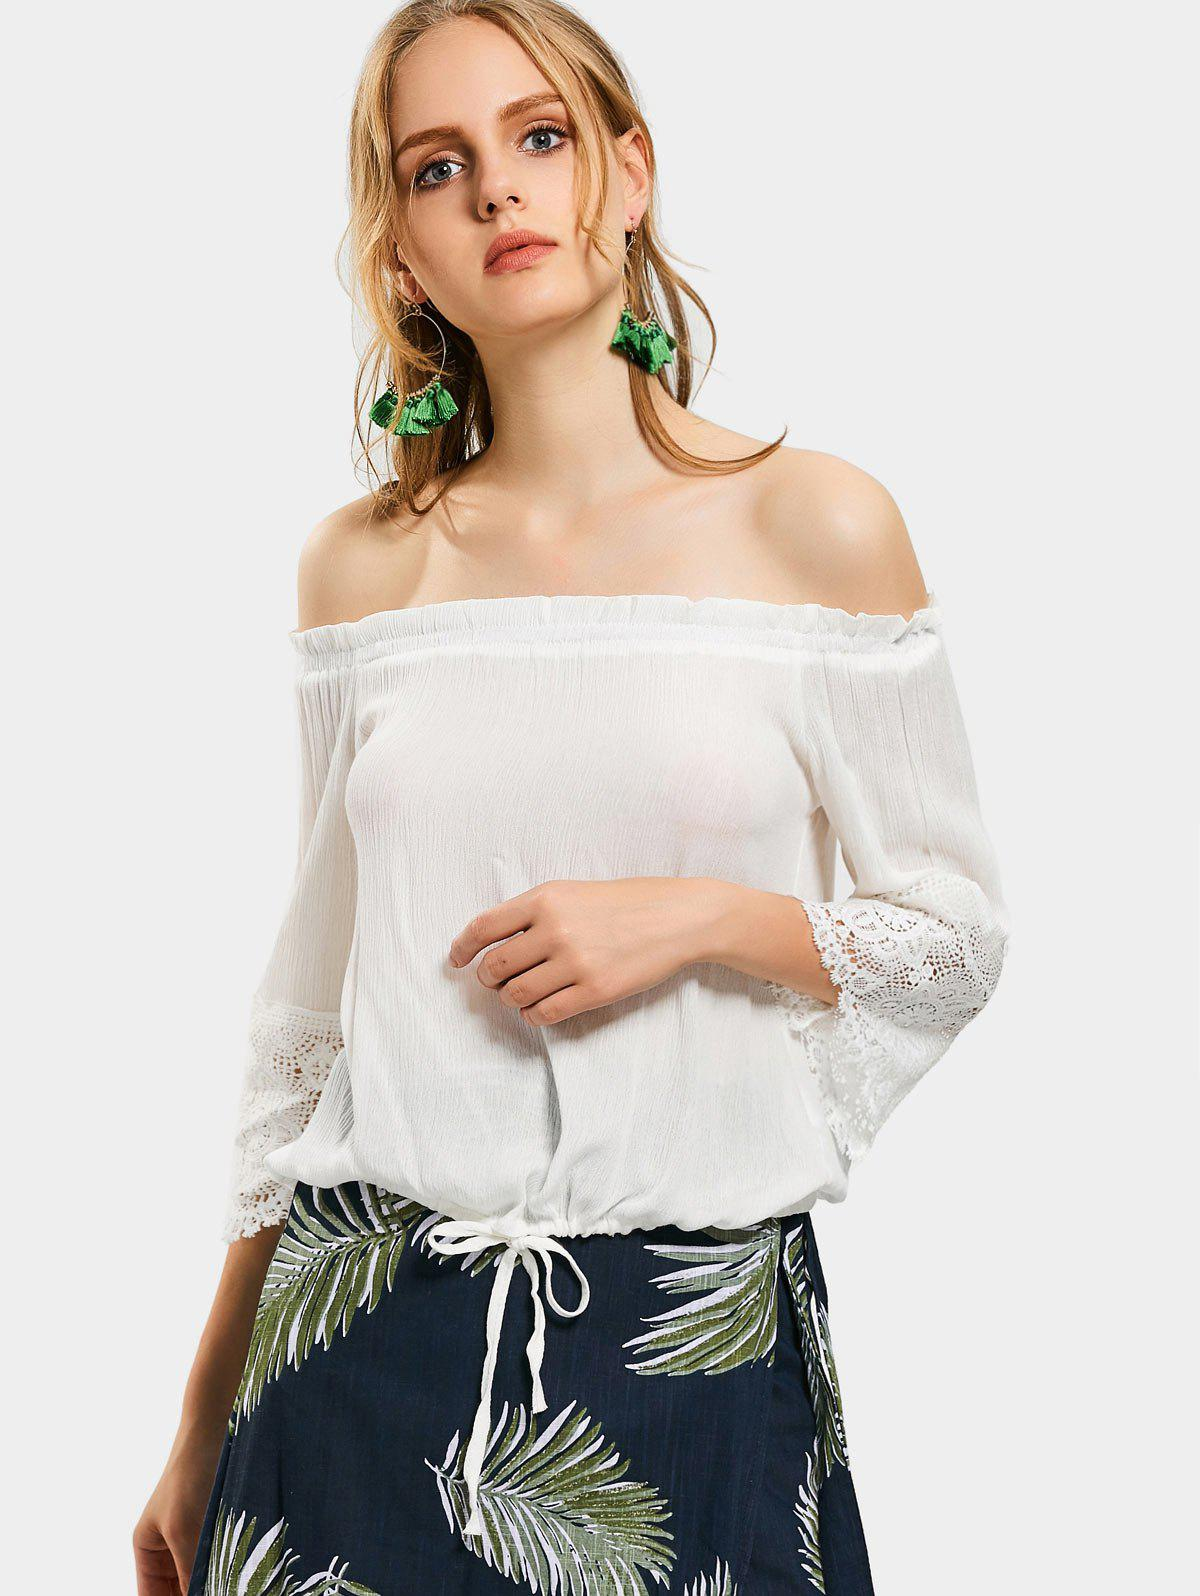 Aus der Schulter Lace Panel Einfache Bluse